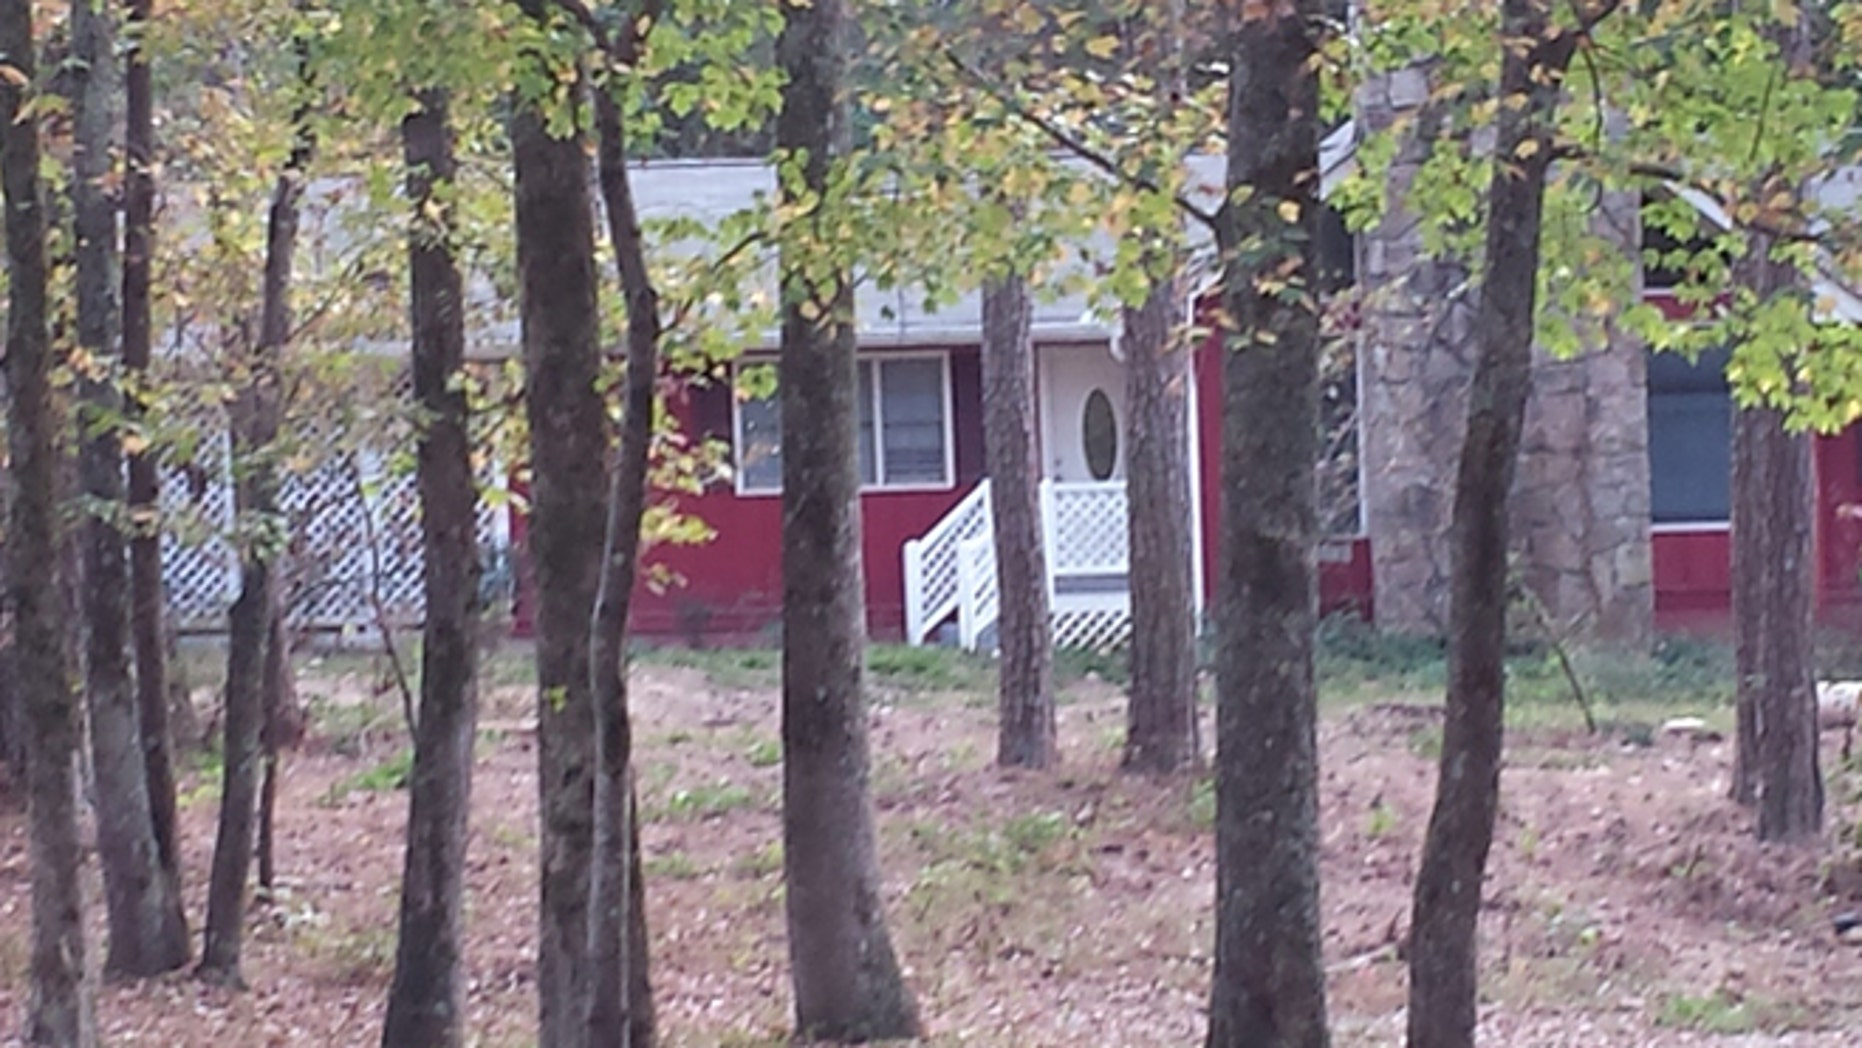 Clayton County Police Department say a 12-year-old boy was accidentally shot in this house in Jonesboro, Georgia, Saturday. (Fox 5 Atlanta)